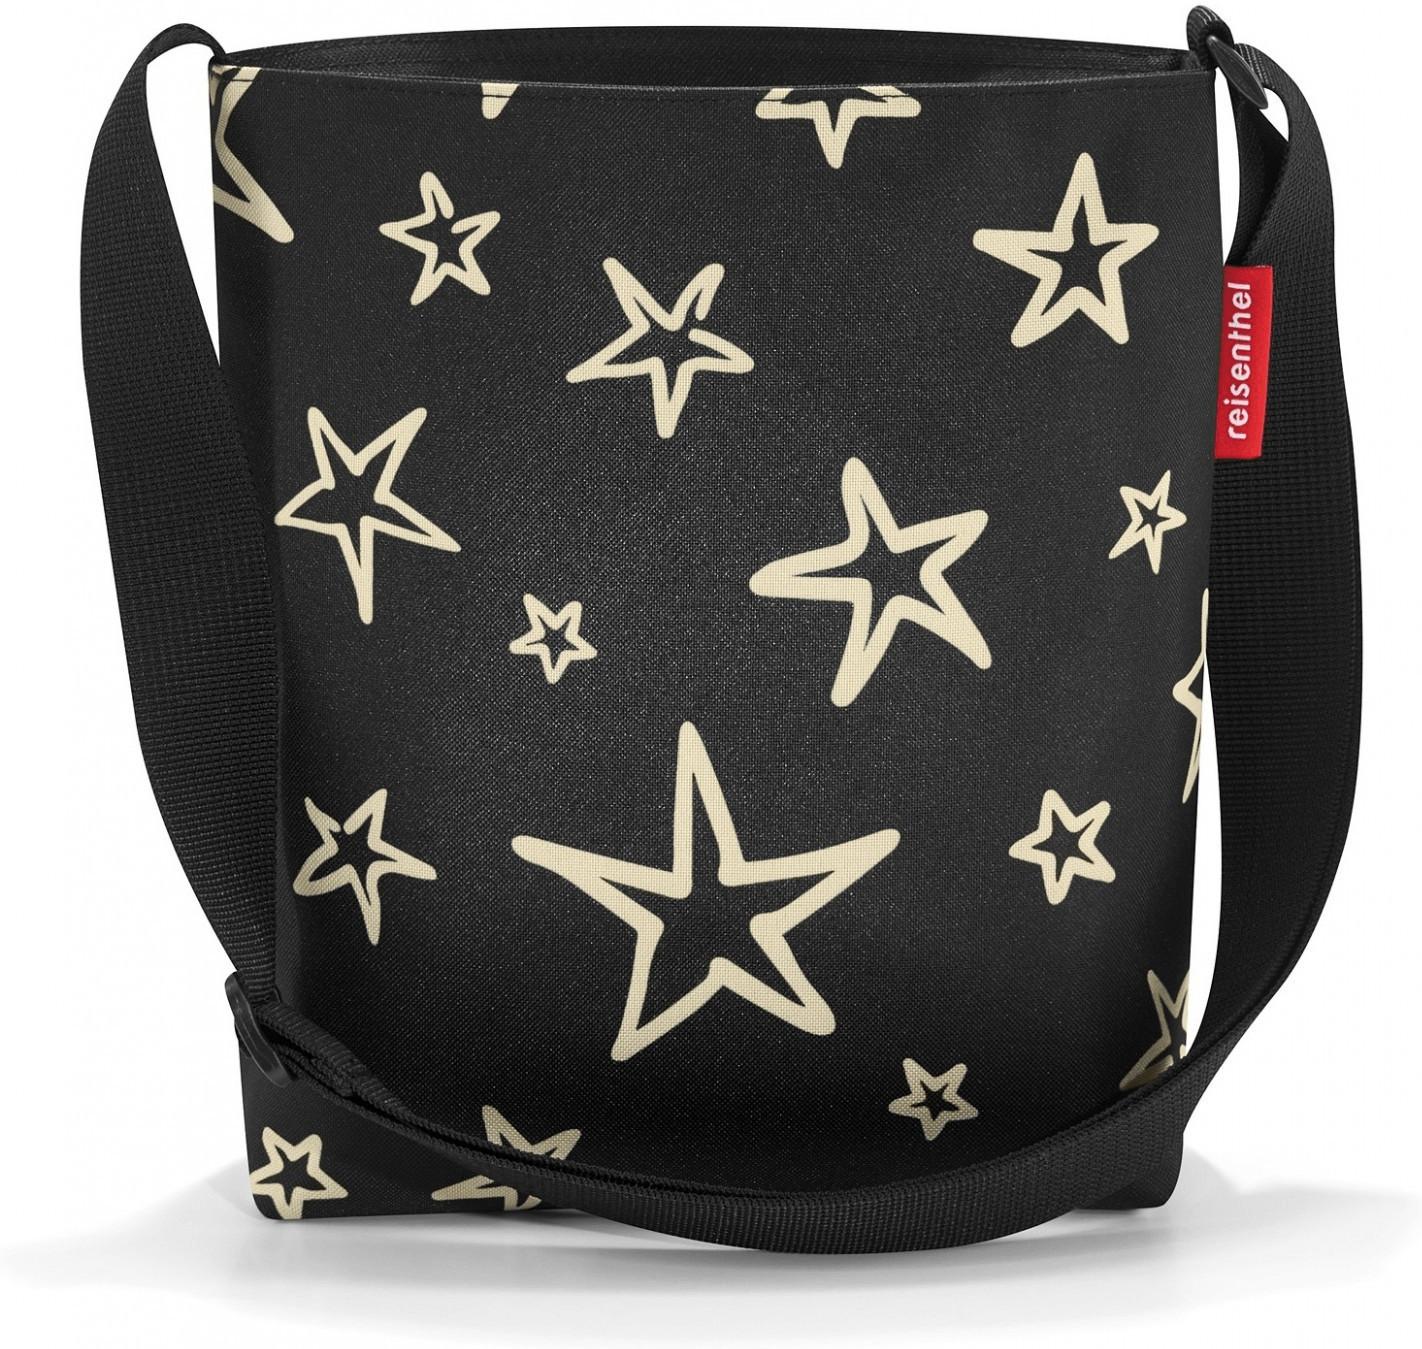 Reisenthel Shoulderbag S stars